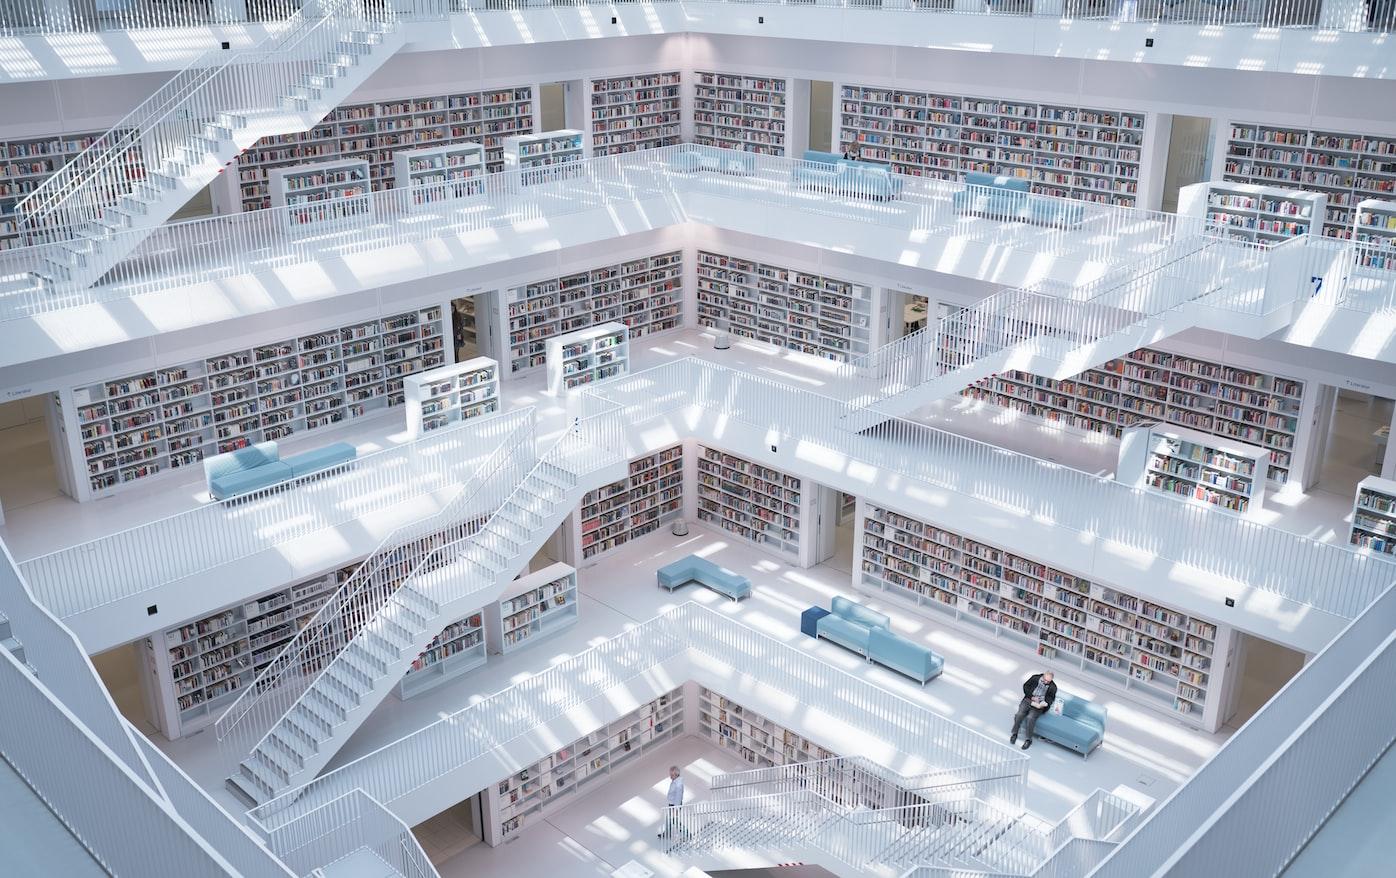 kien truc duc stadtbibliothek stuttgart